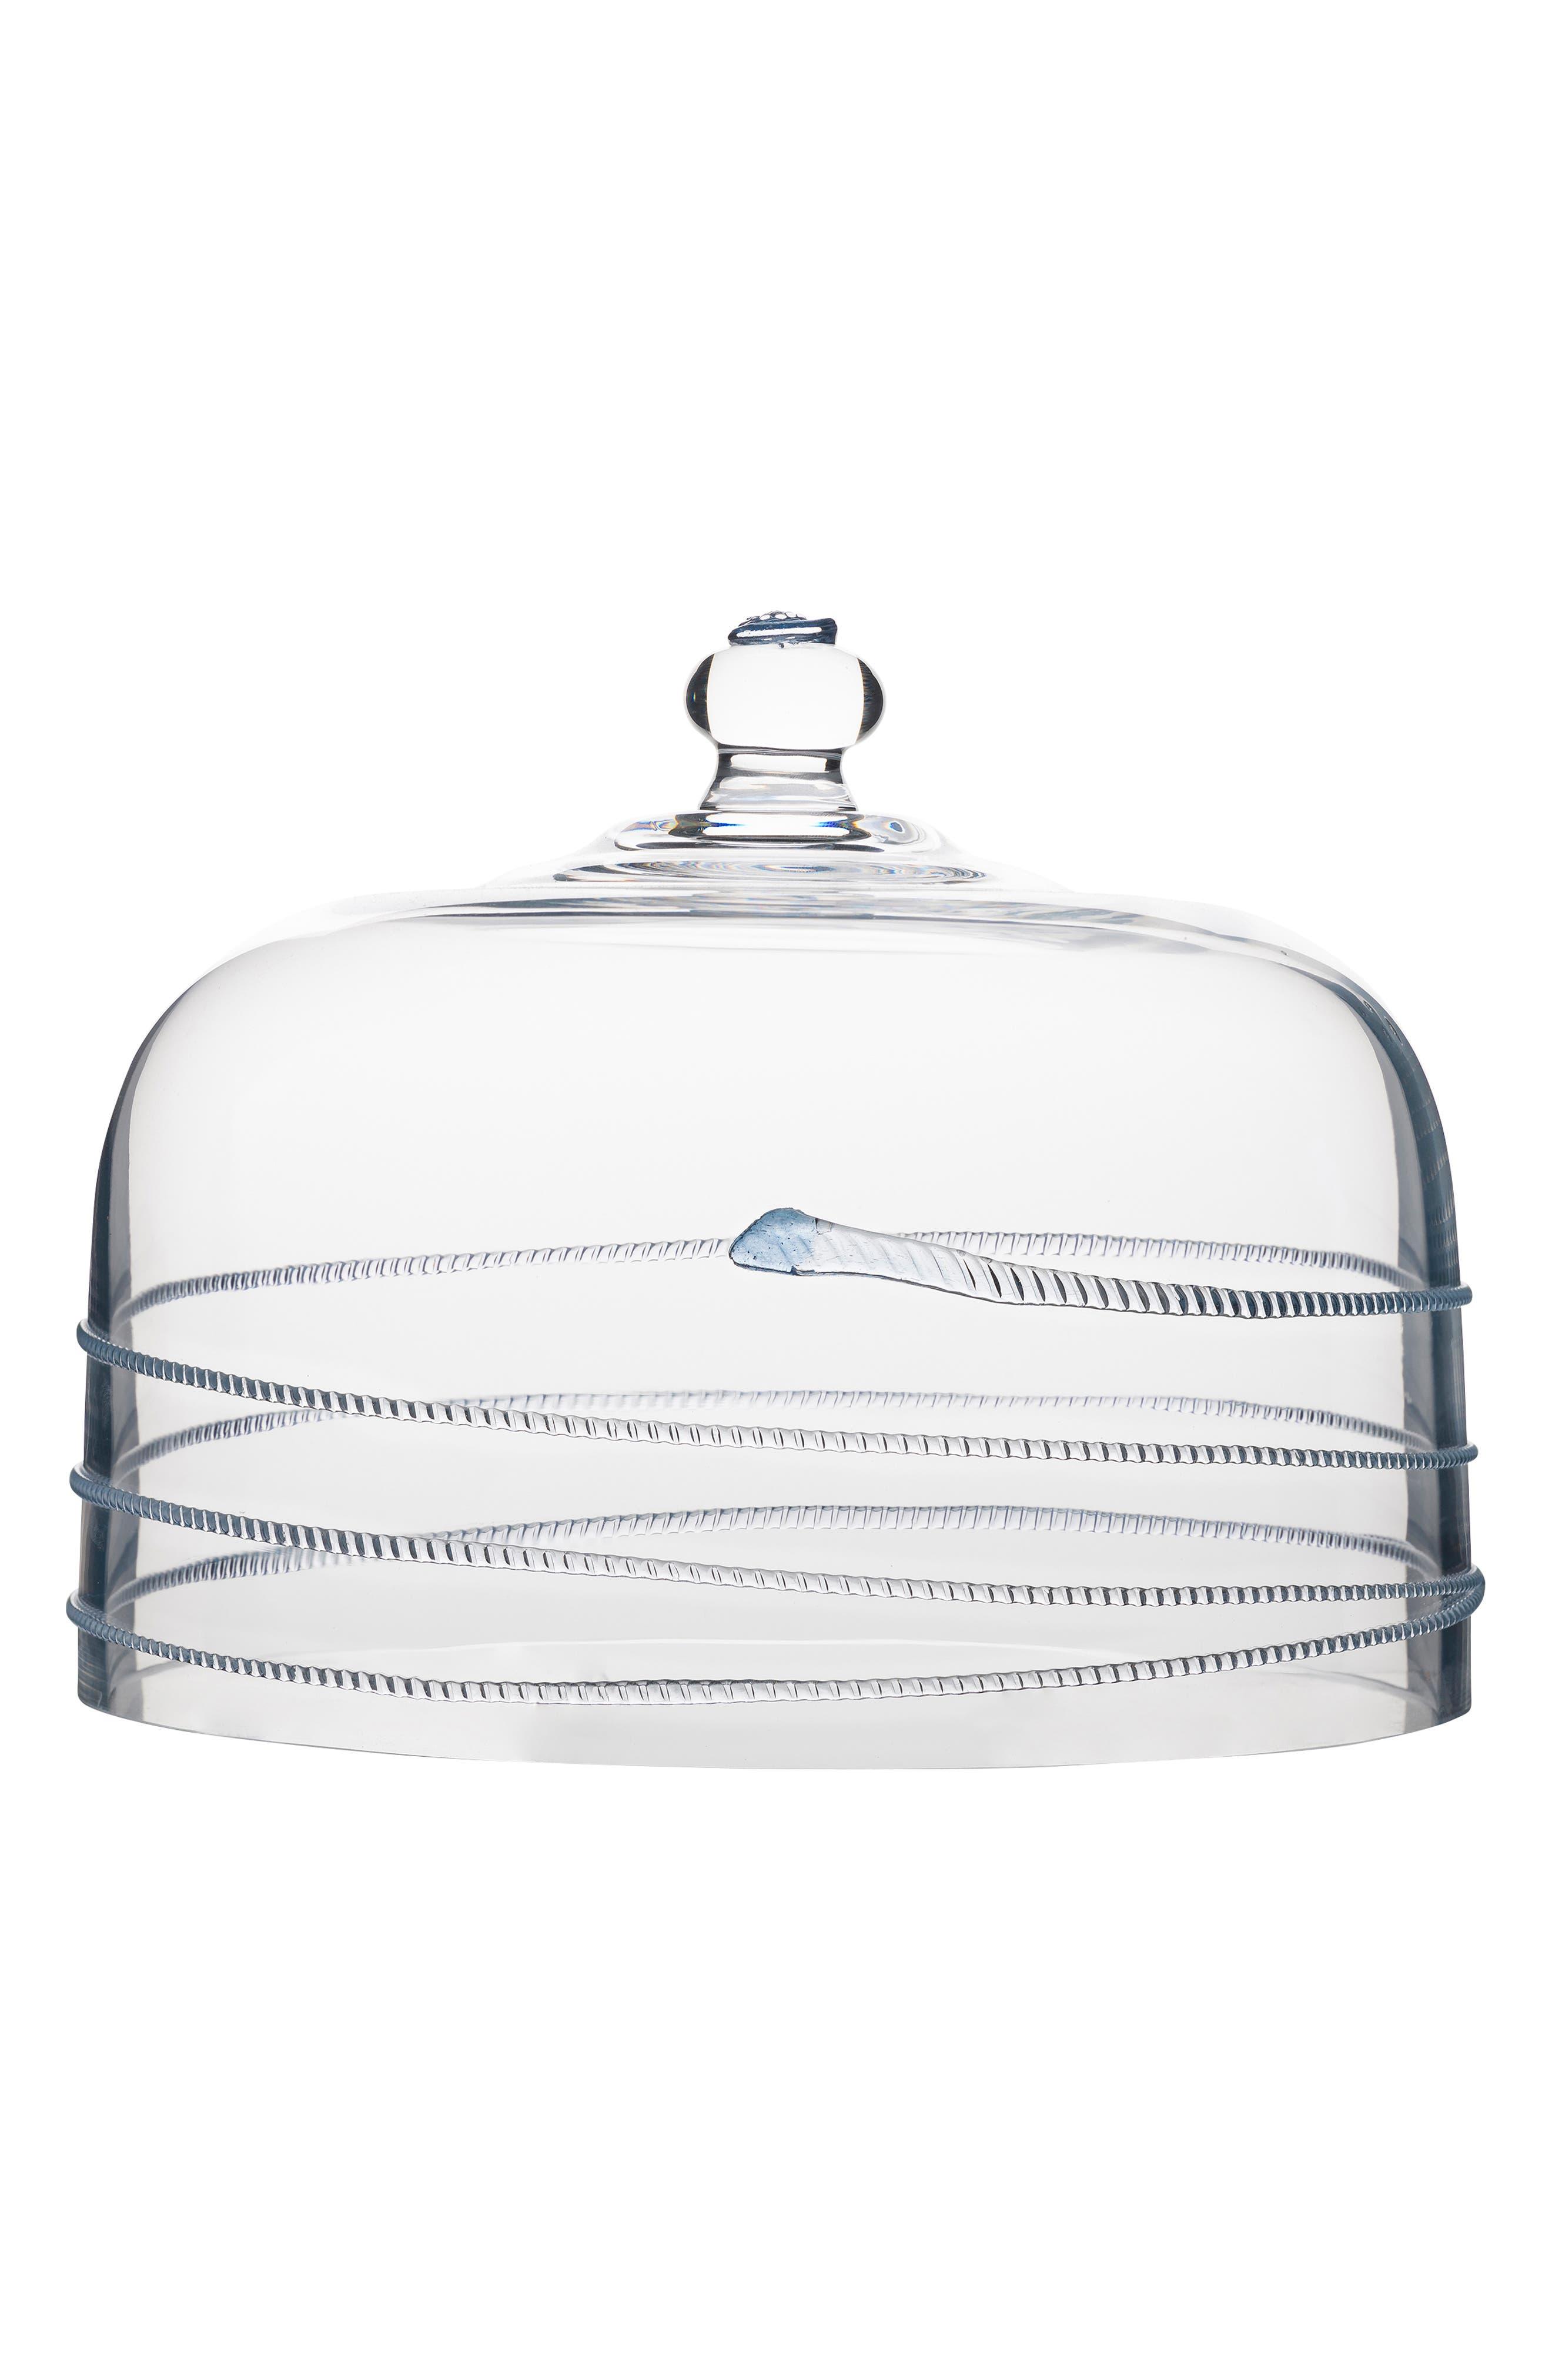 JULISKA Amalia Glass Cake Dome, Main, color, CLEAR